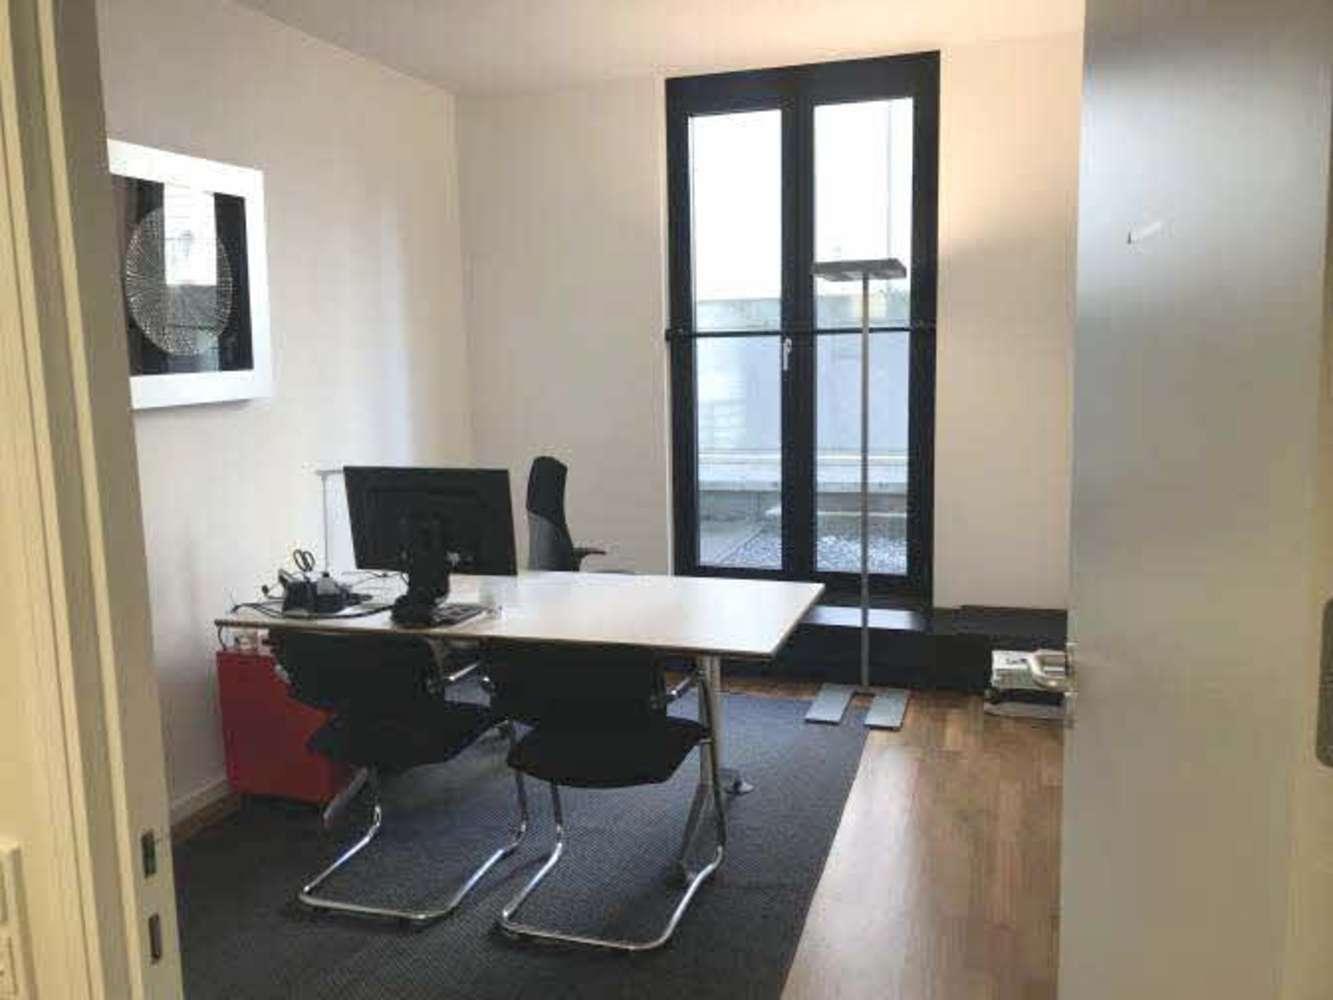 Büros Frankfurt am main, 60329 - Büro - Frankfurt am Main, Bahnhofsviertel - F0050 - 10482694